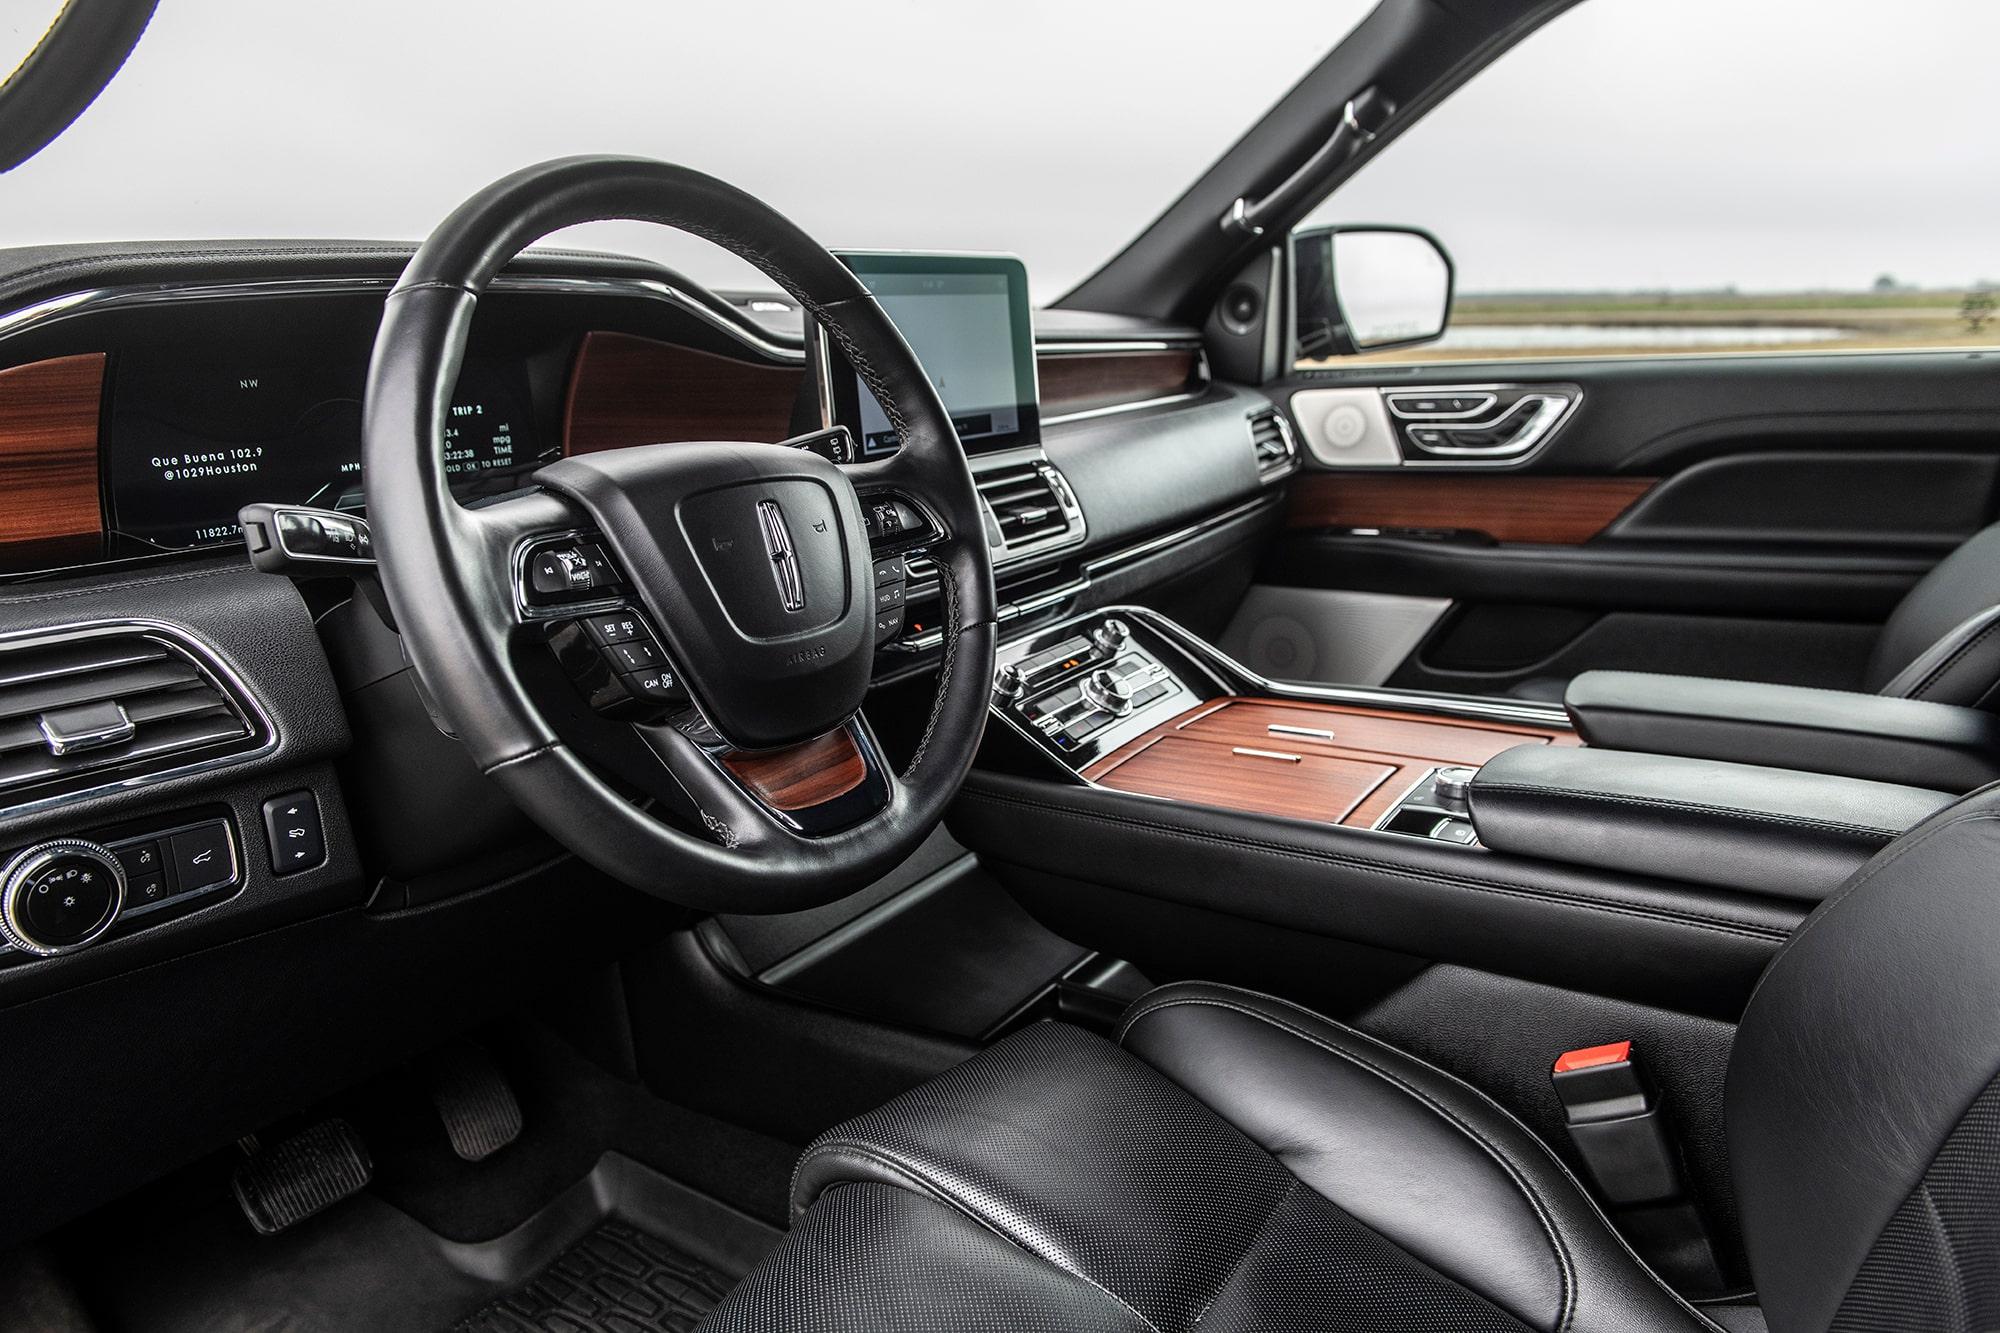 Hennessey HPE600 Lincoln Navigator 2019 24-hennessey-lincoln-navigator-hpe600-min